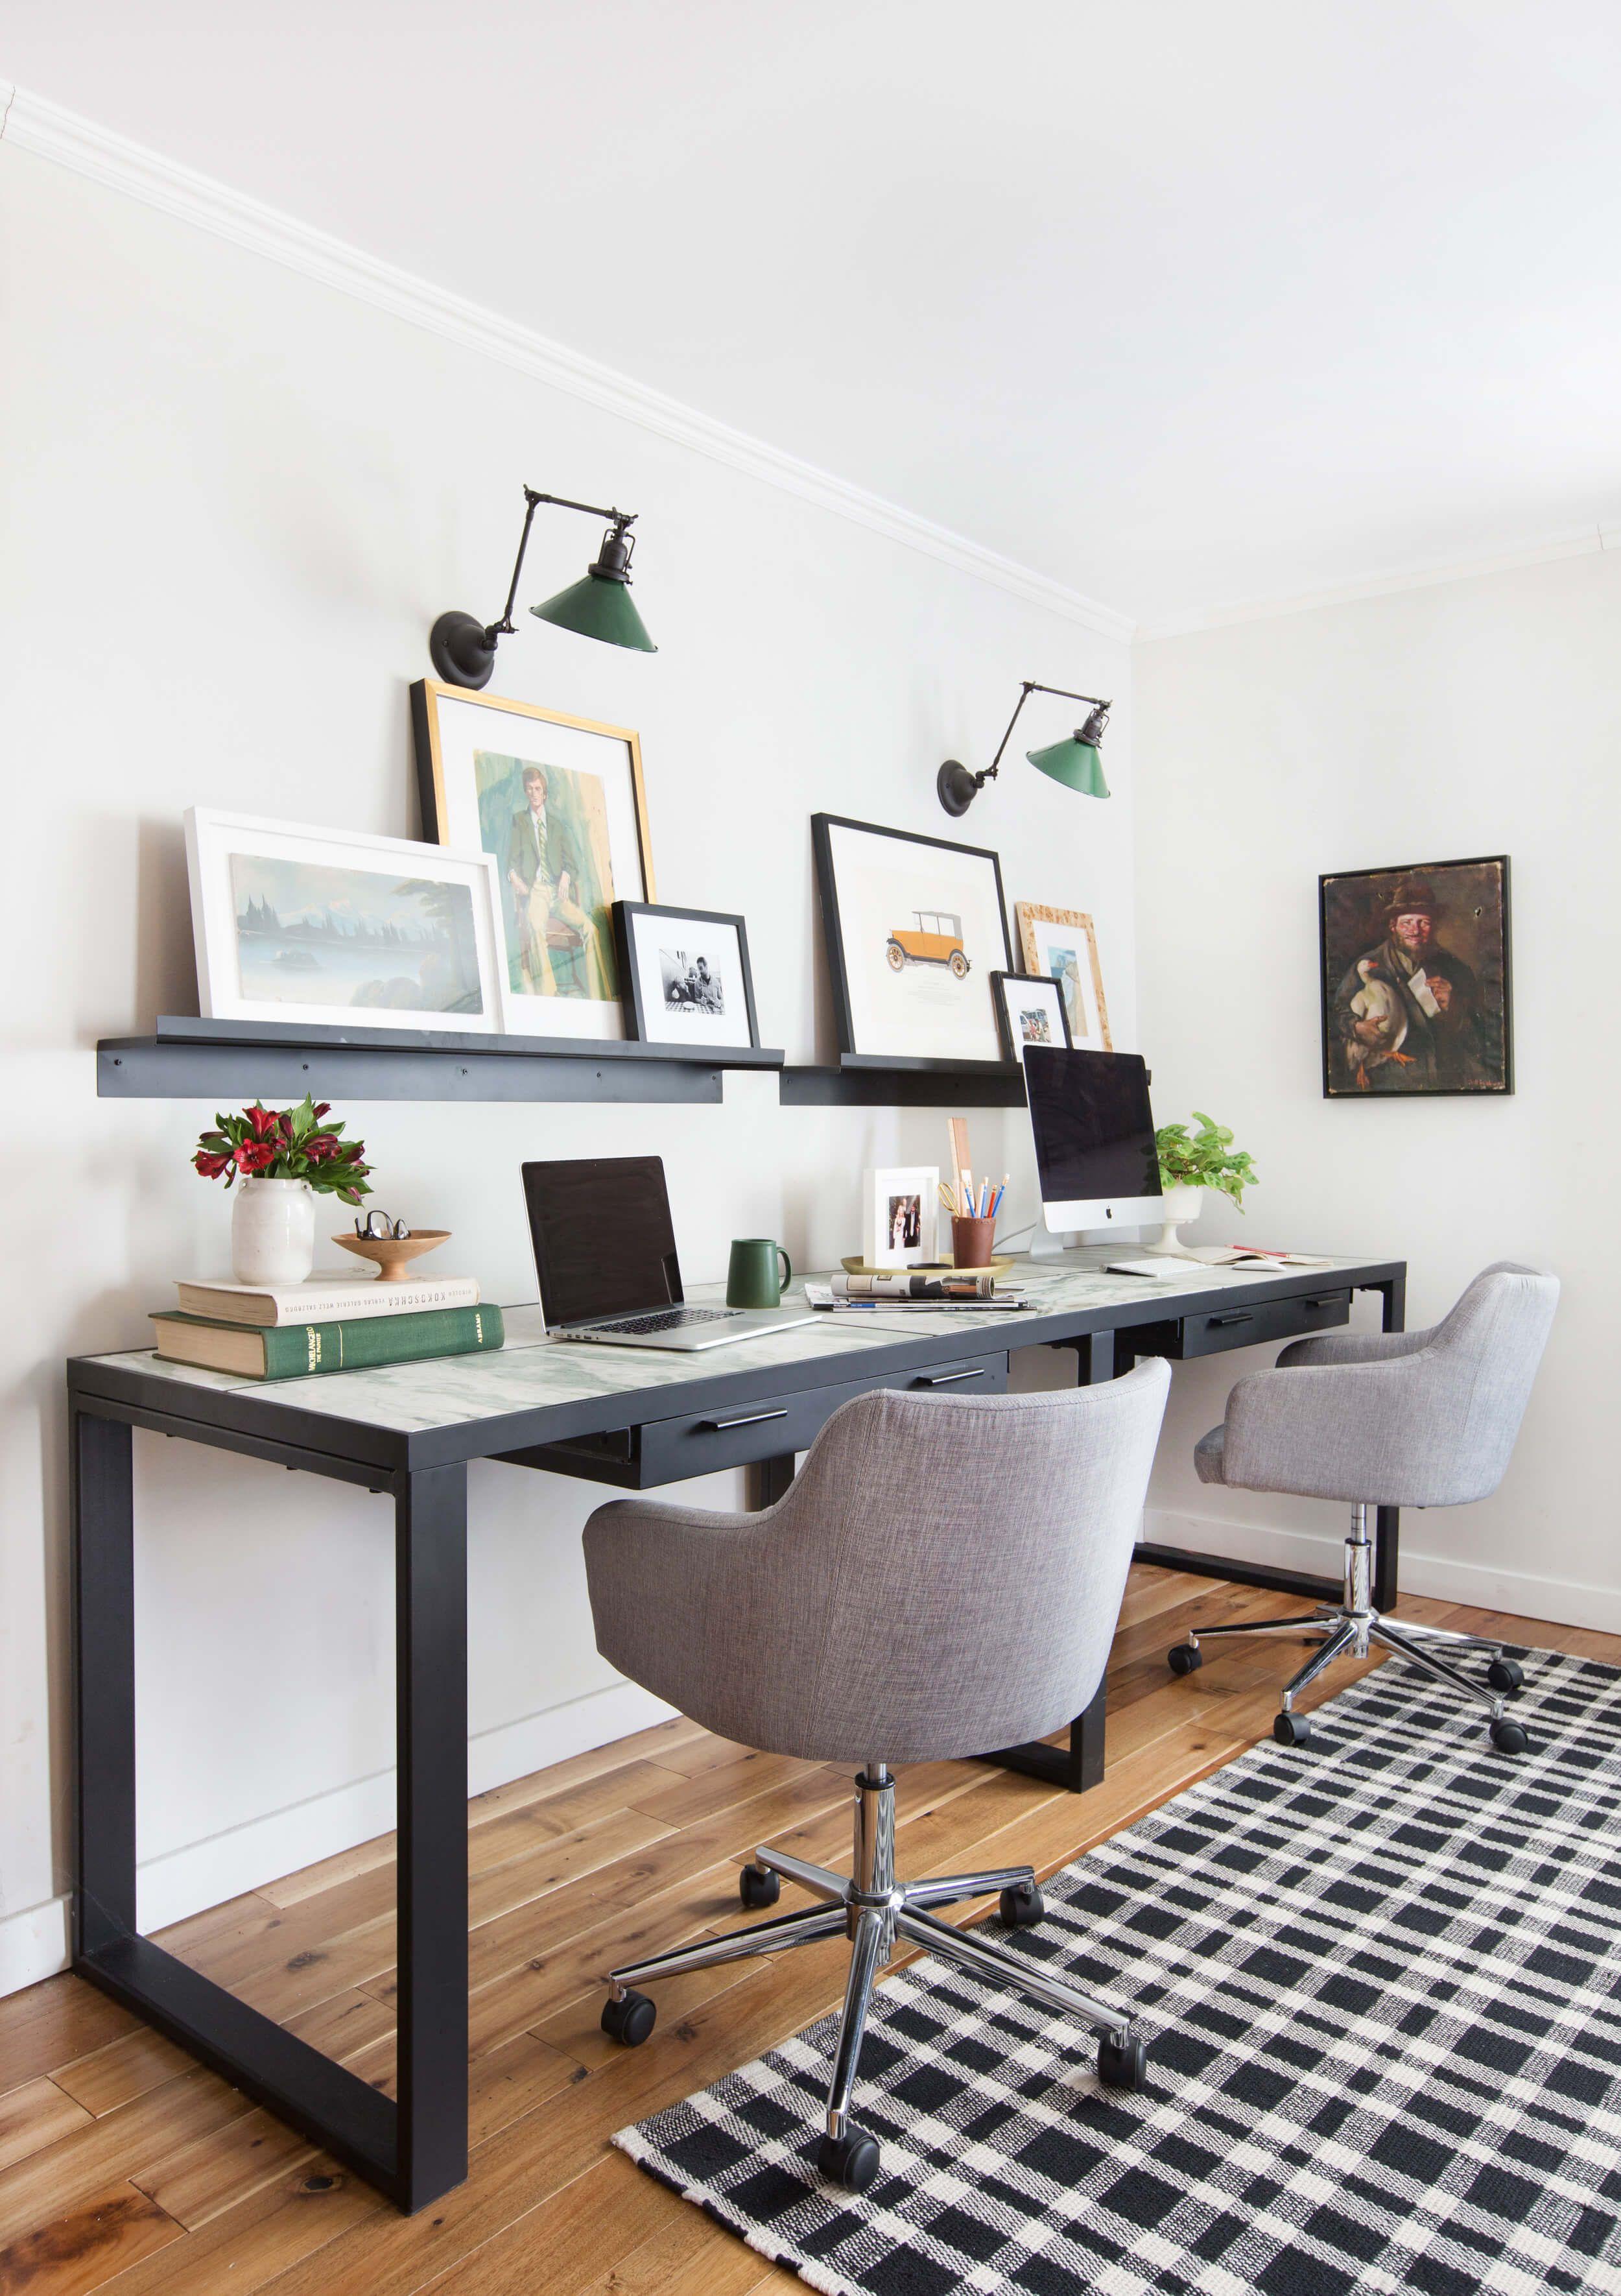 Custom Framing For Our Home Office With Framebridge Cheap Office